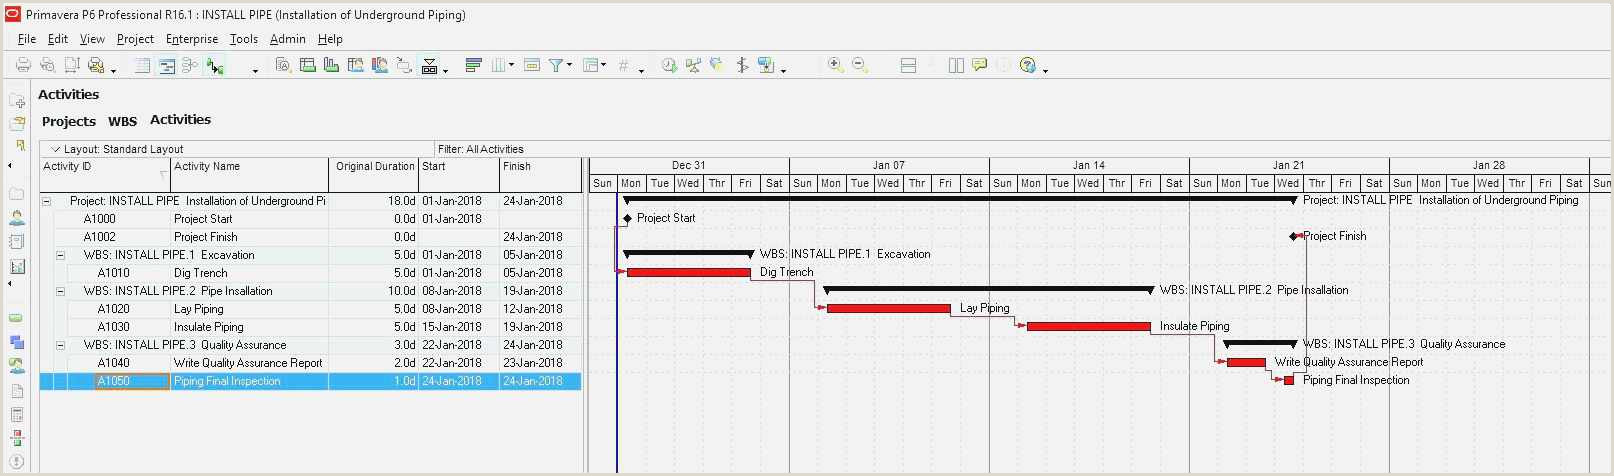 Fire Department Shift Calendar Creator Free 12 Hour Shift Template Gure Kubkireklamowe Download